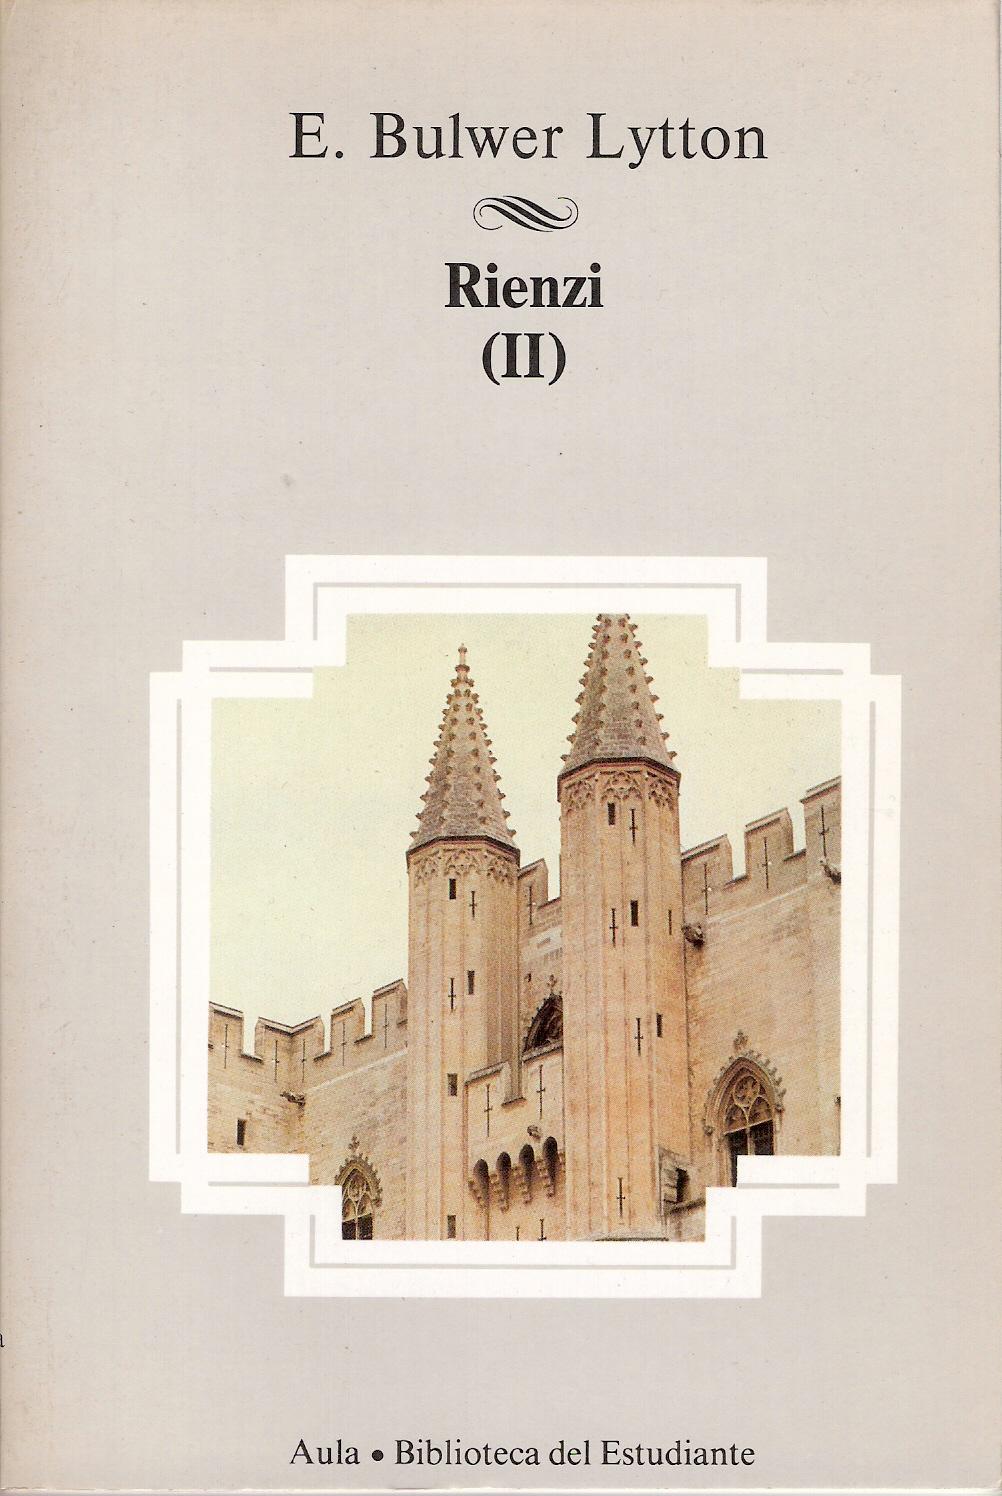 Rienzi II